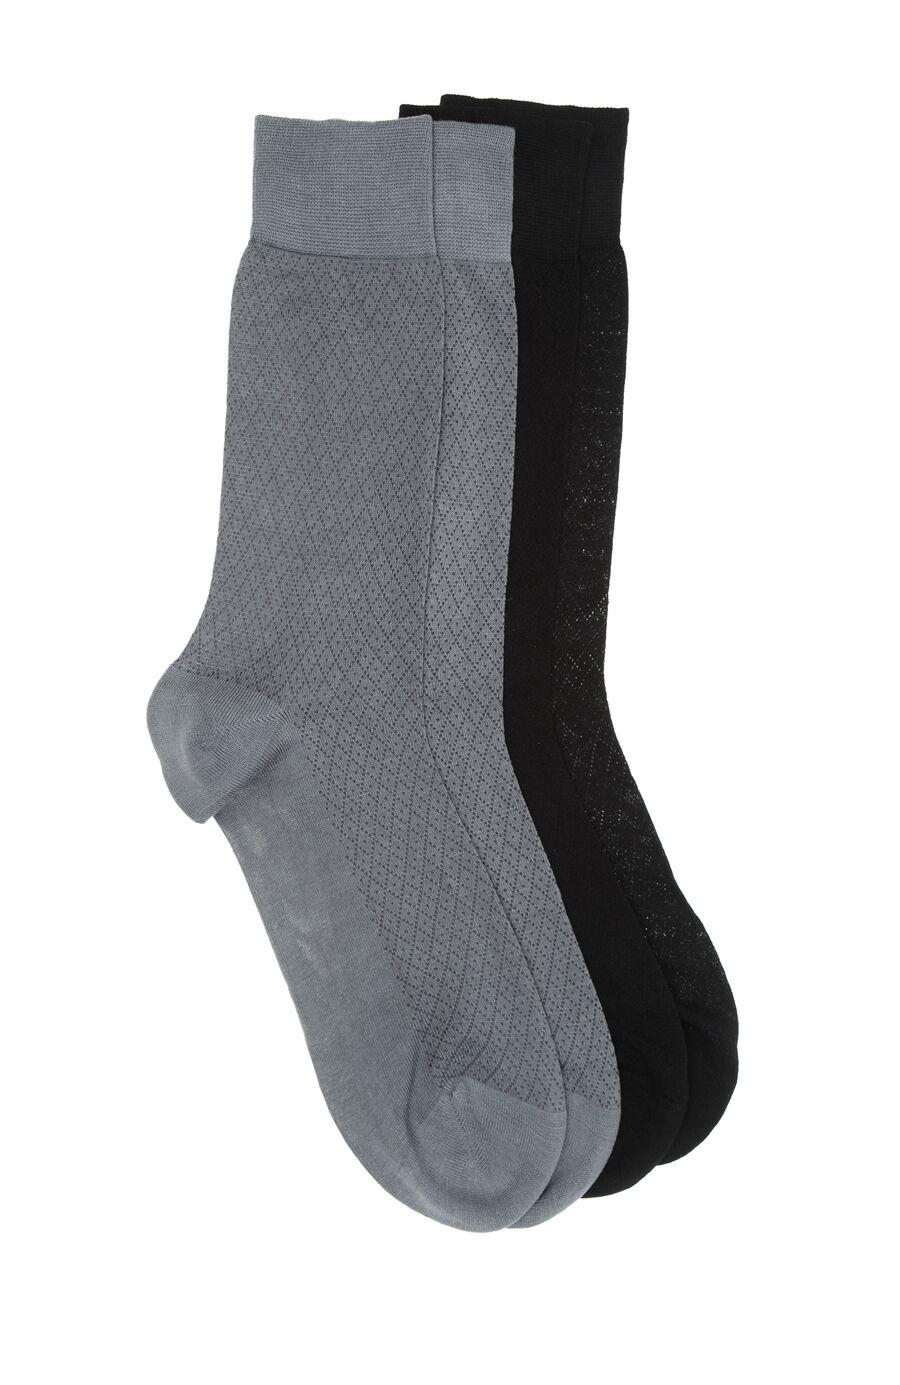 2 Li Erkek Çorap Seti